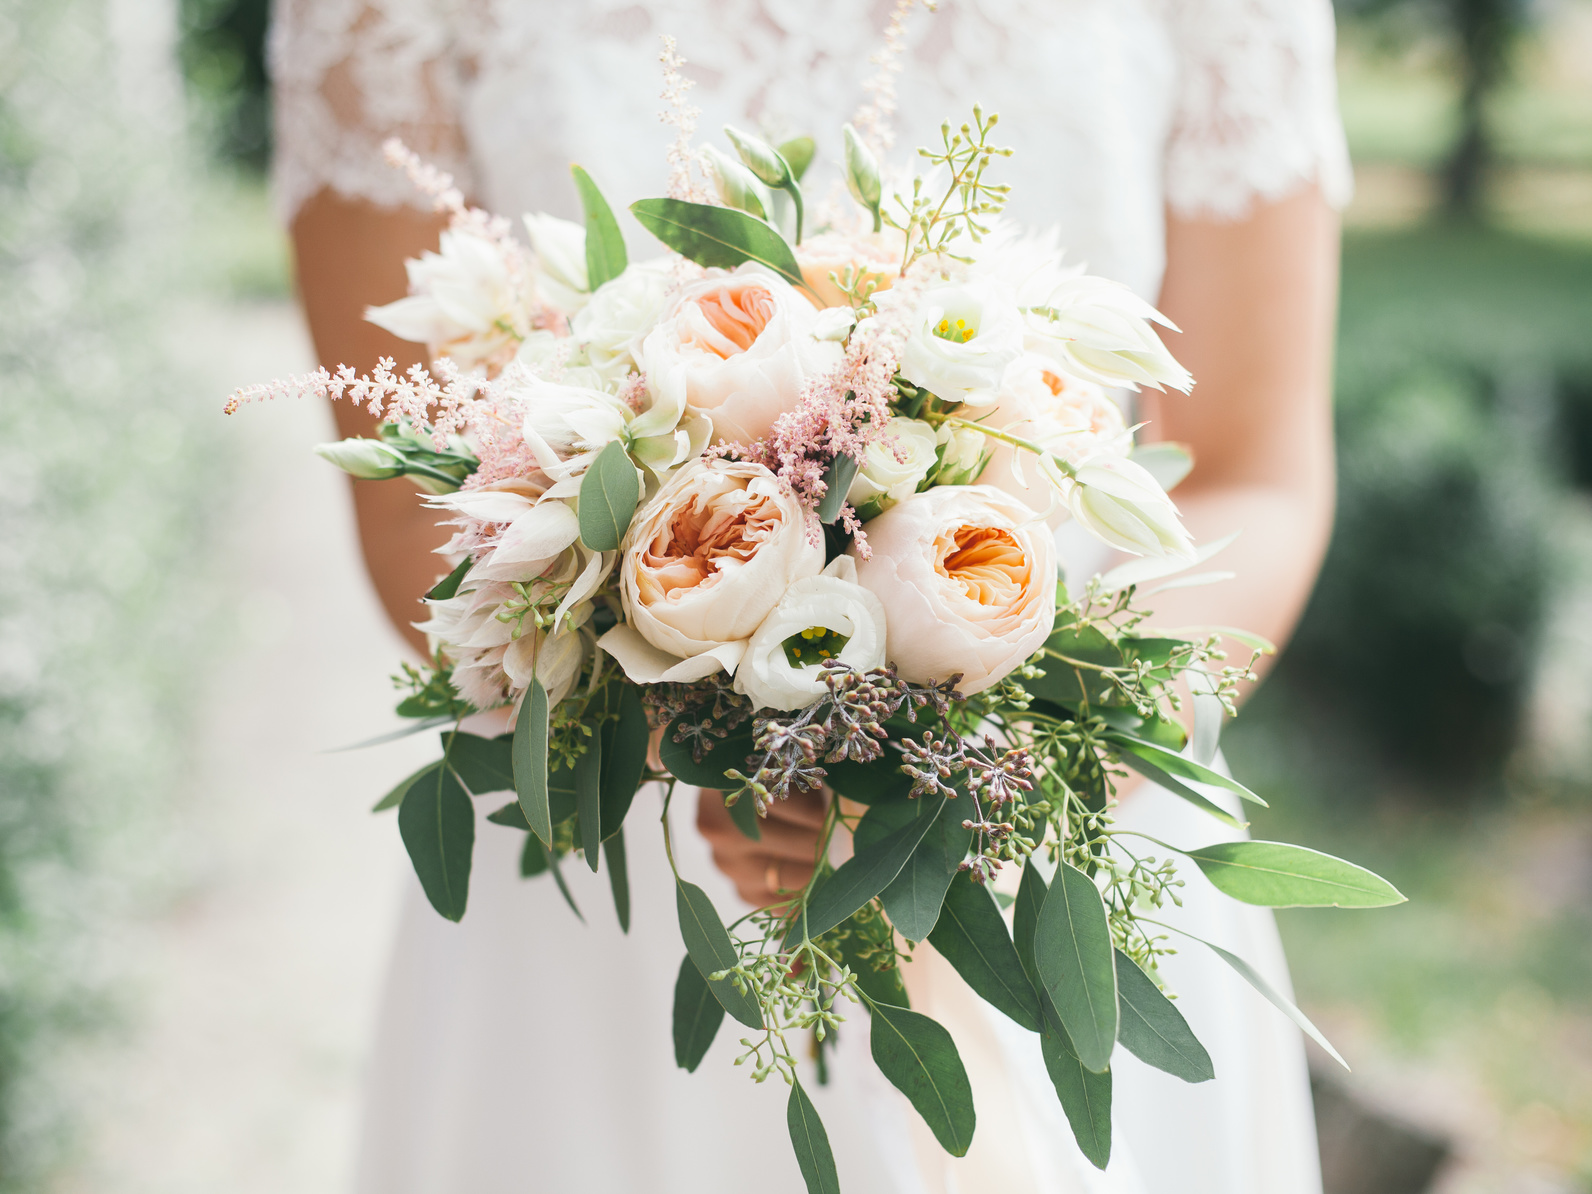 5 creative wedding blog ideas brides will love. Black Bedroom Furniture Sets. Home Design Ideas